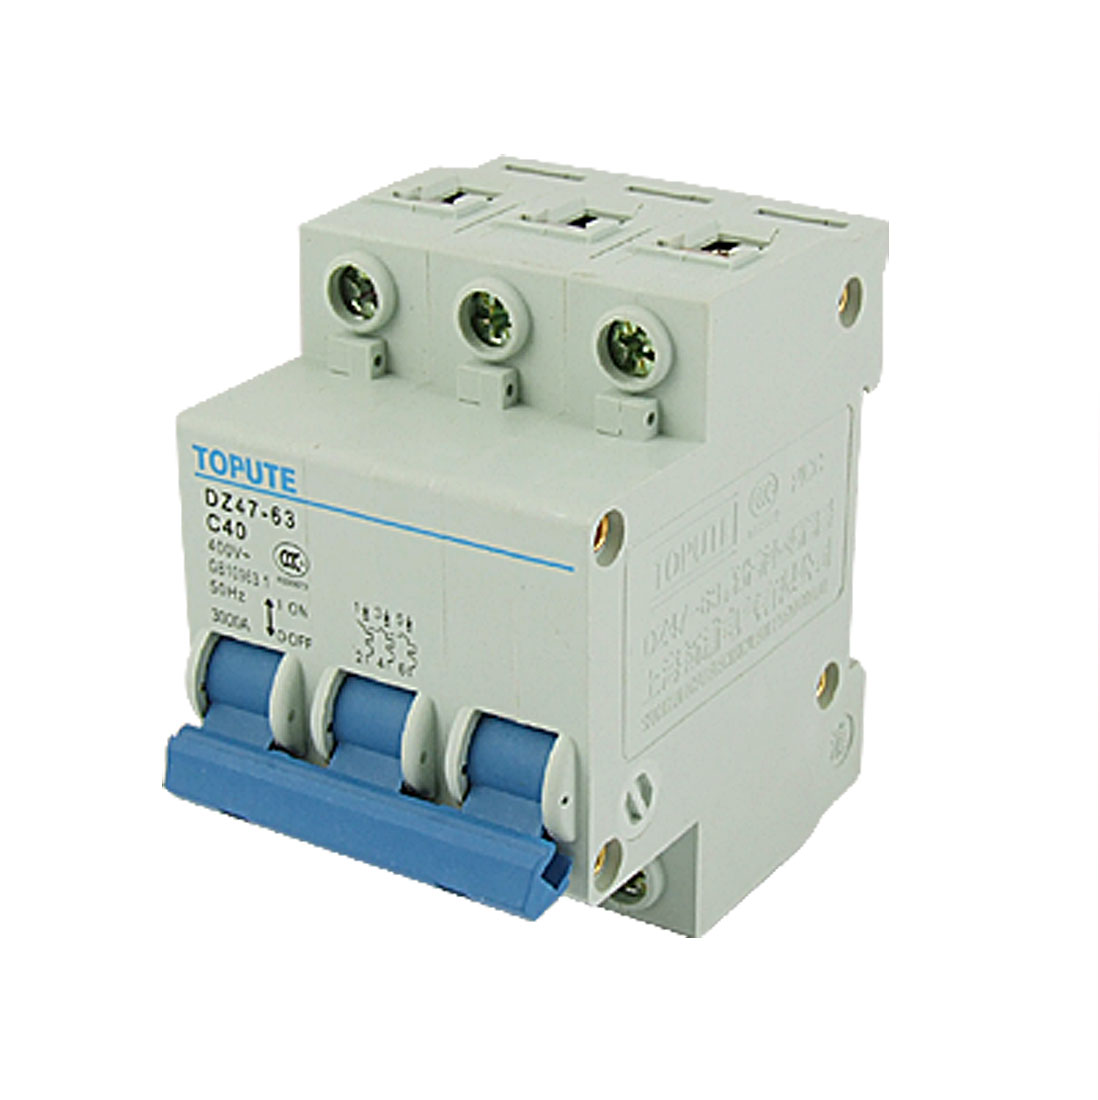 DZ47-63 C63 40A Three Poles AC 400V Mini Circuit Breaker